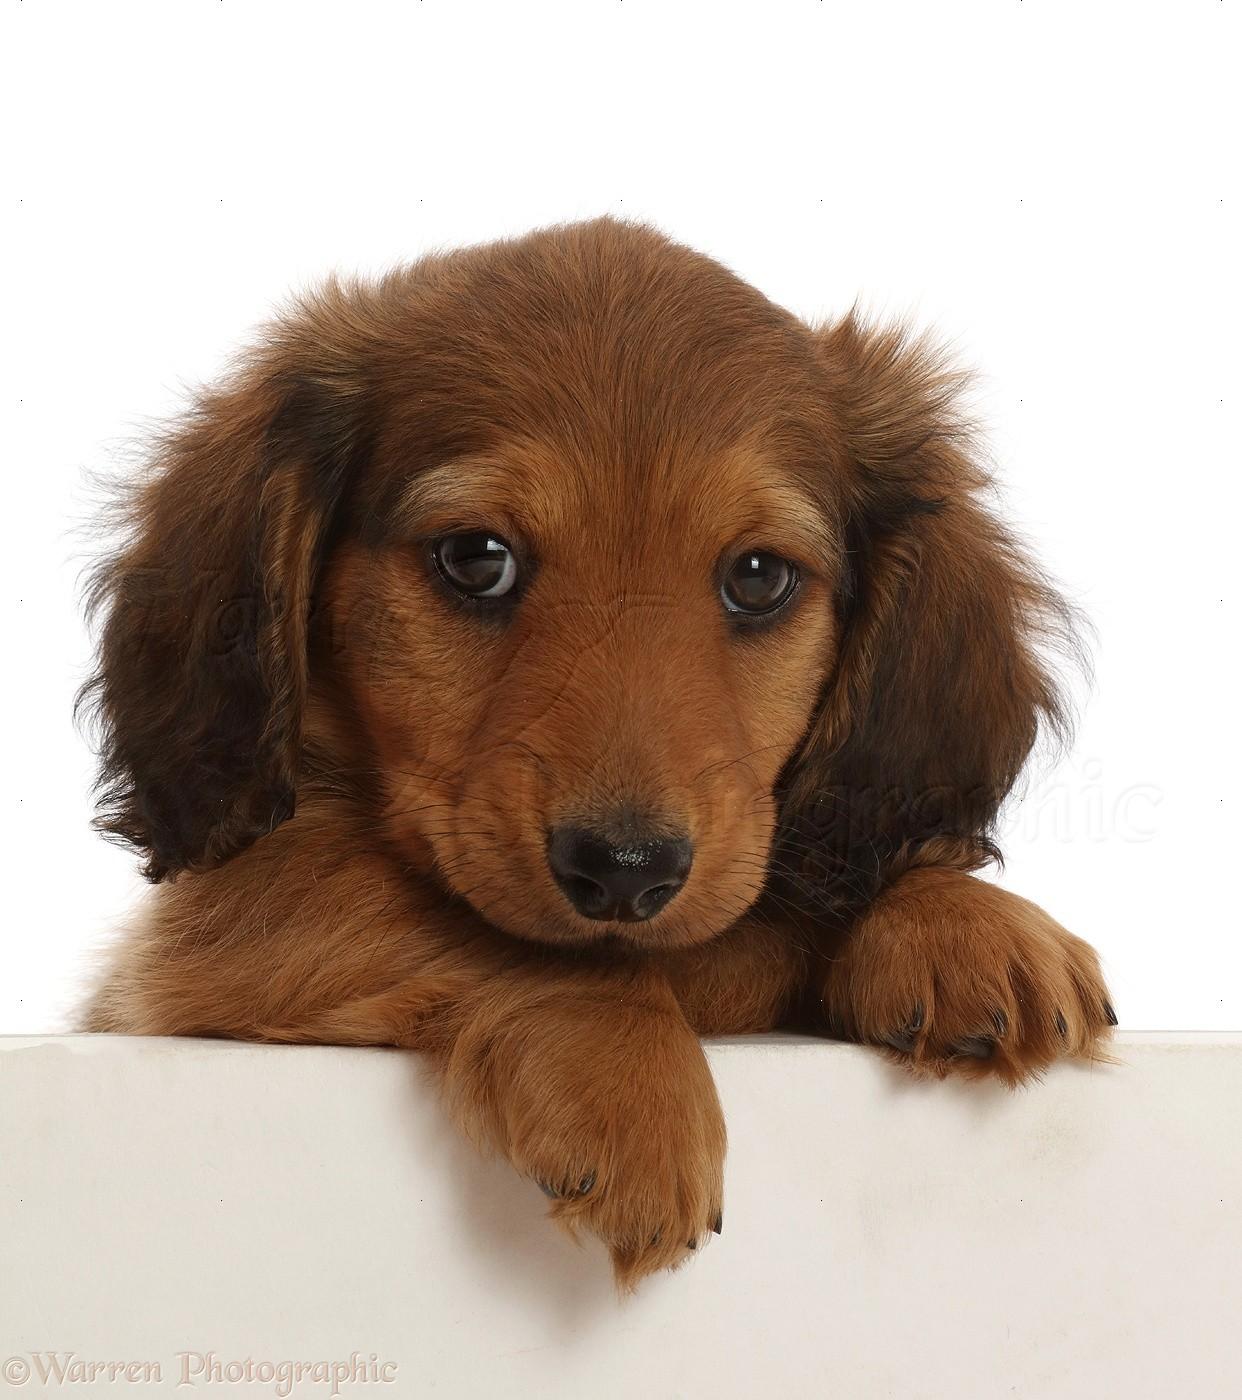 Dog Cream Shaded Dachshund Puppy 7 Weeks Old Paws Over Photo Wp48009